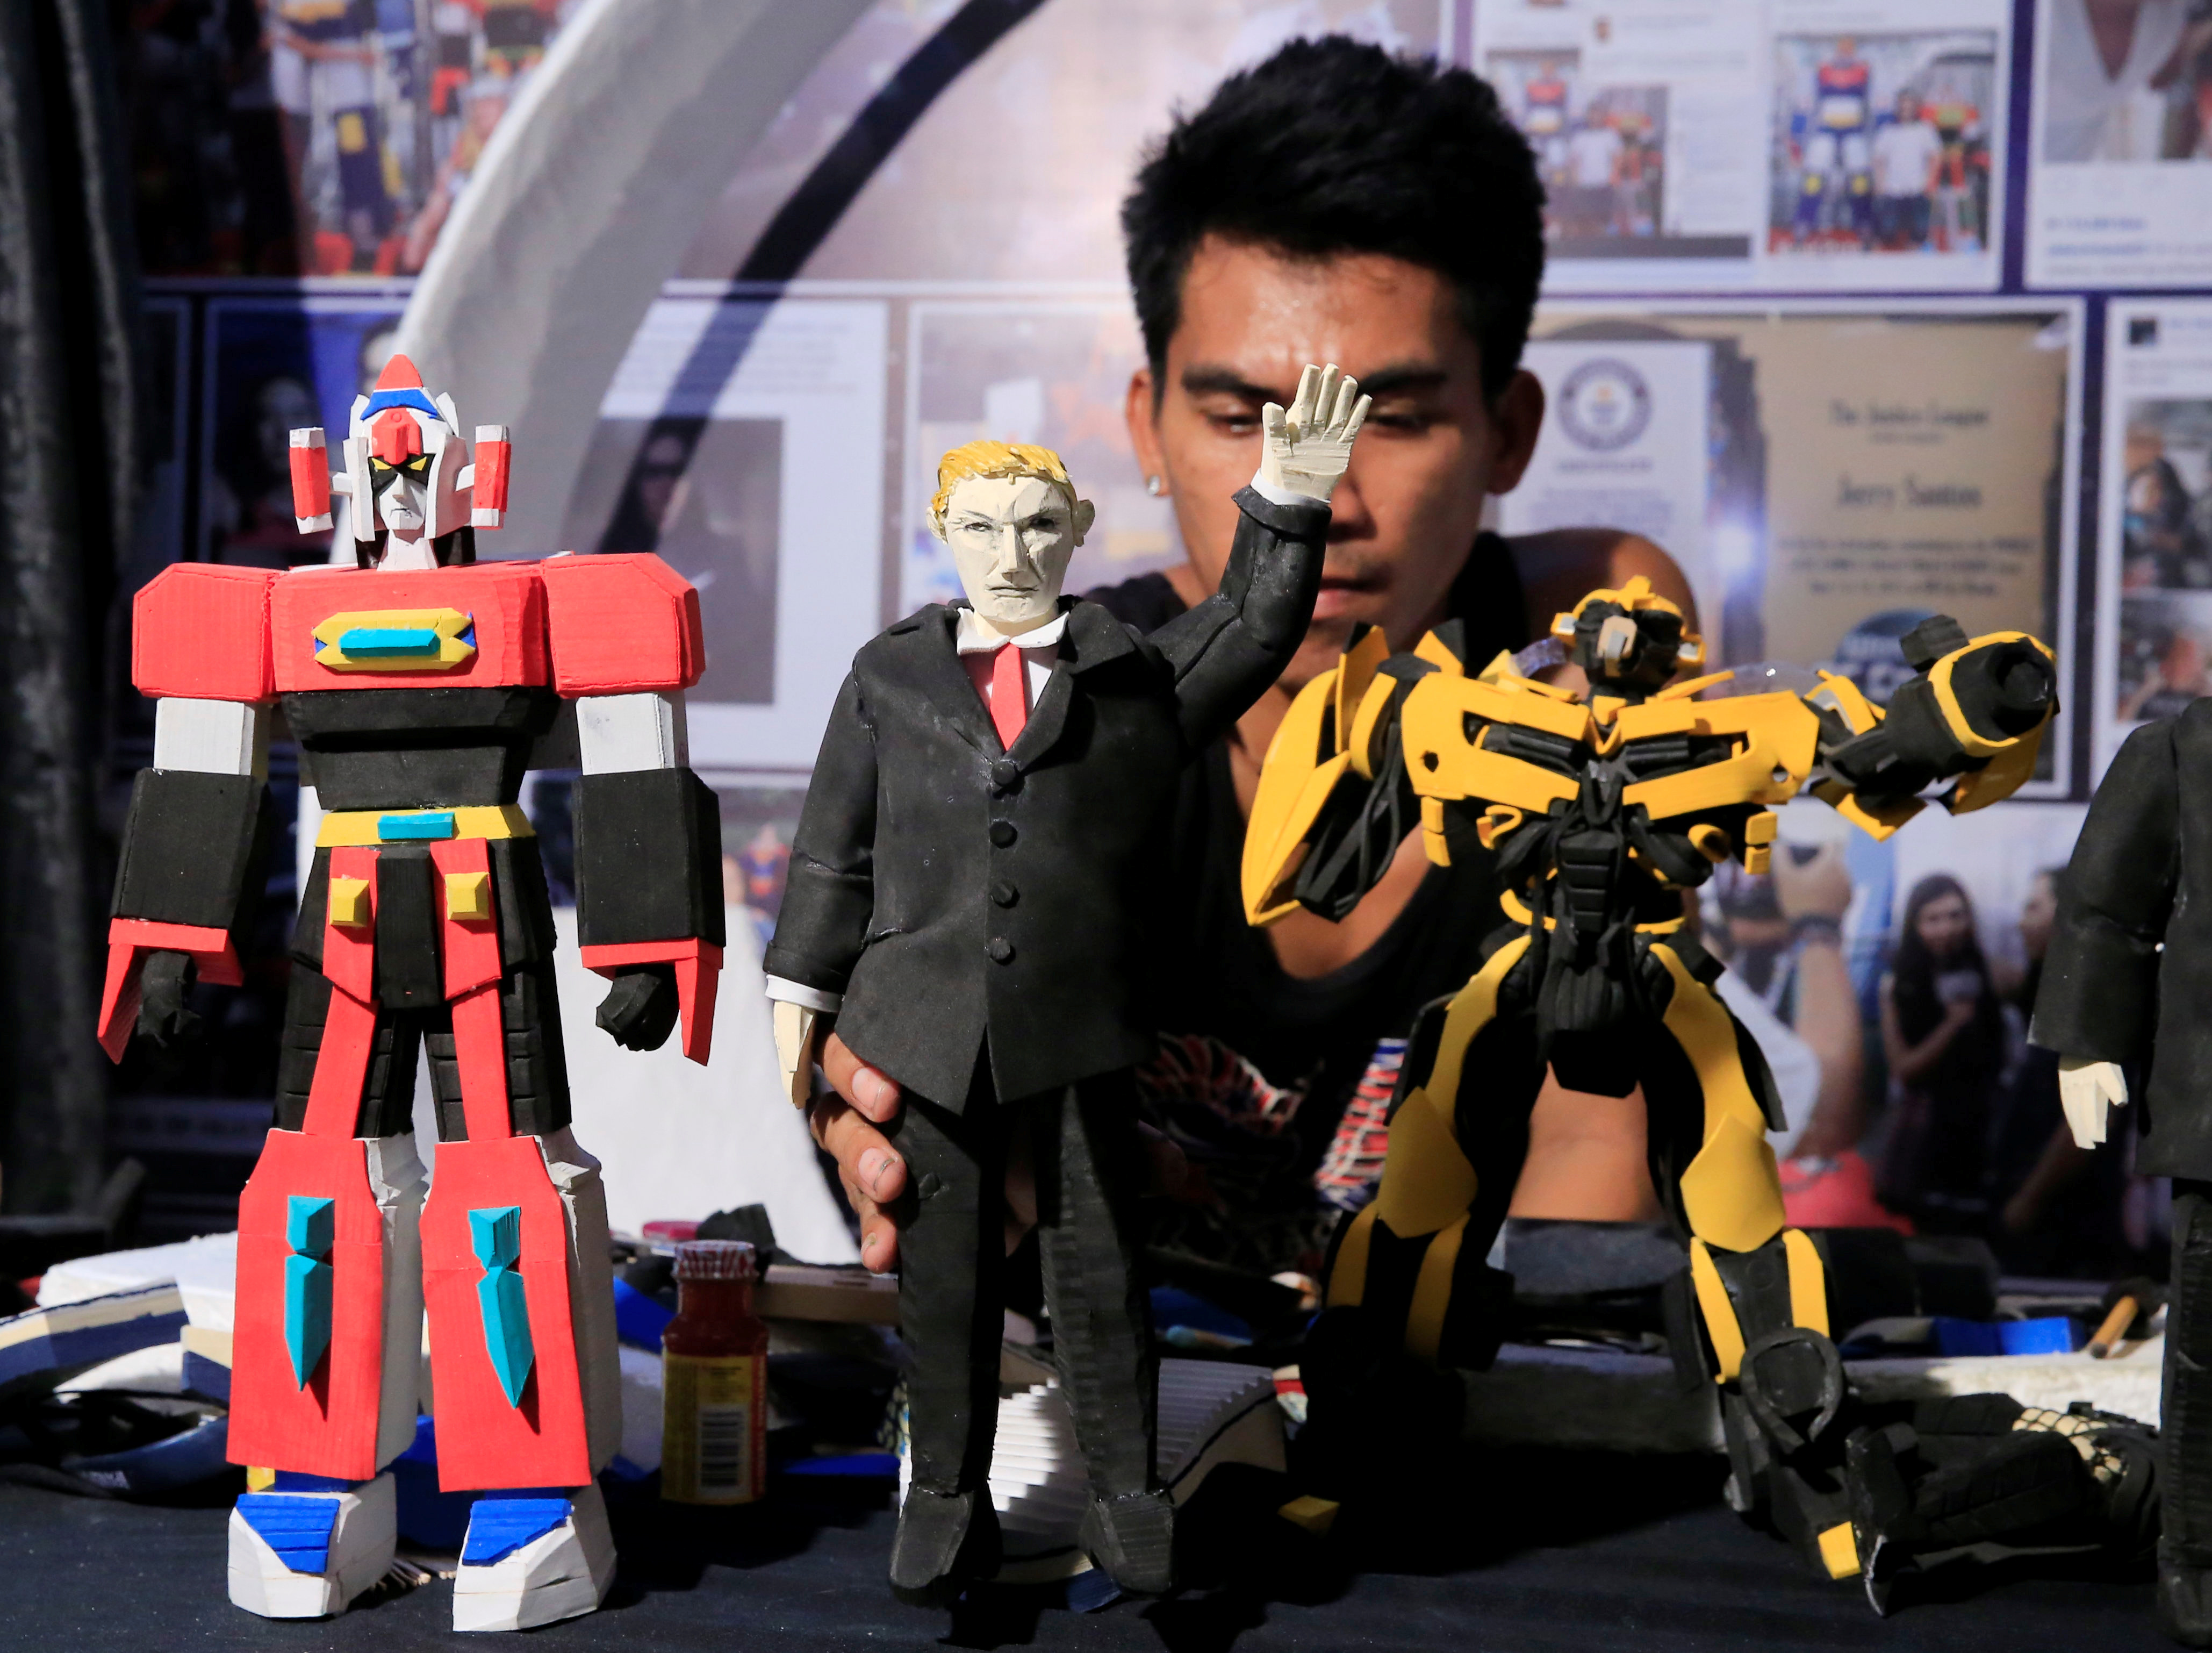 Elmer Padilla, 30, makes a figure of President Donald Trump at his workshop in Manila, Philippines, Nov. 8, 2017.